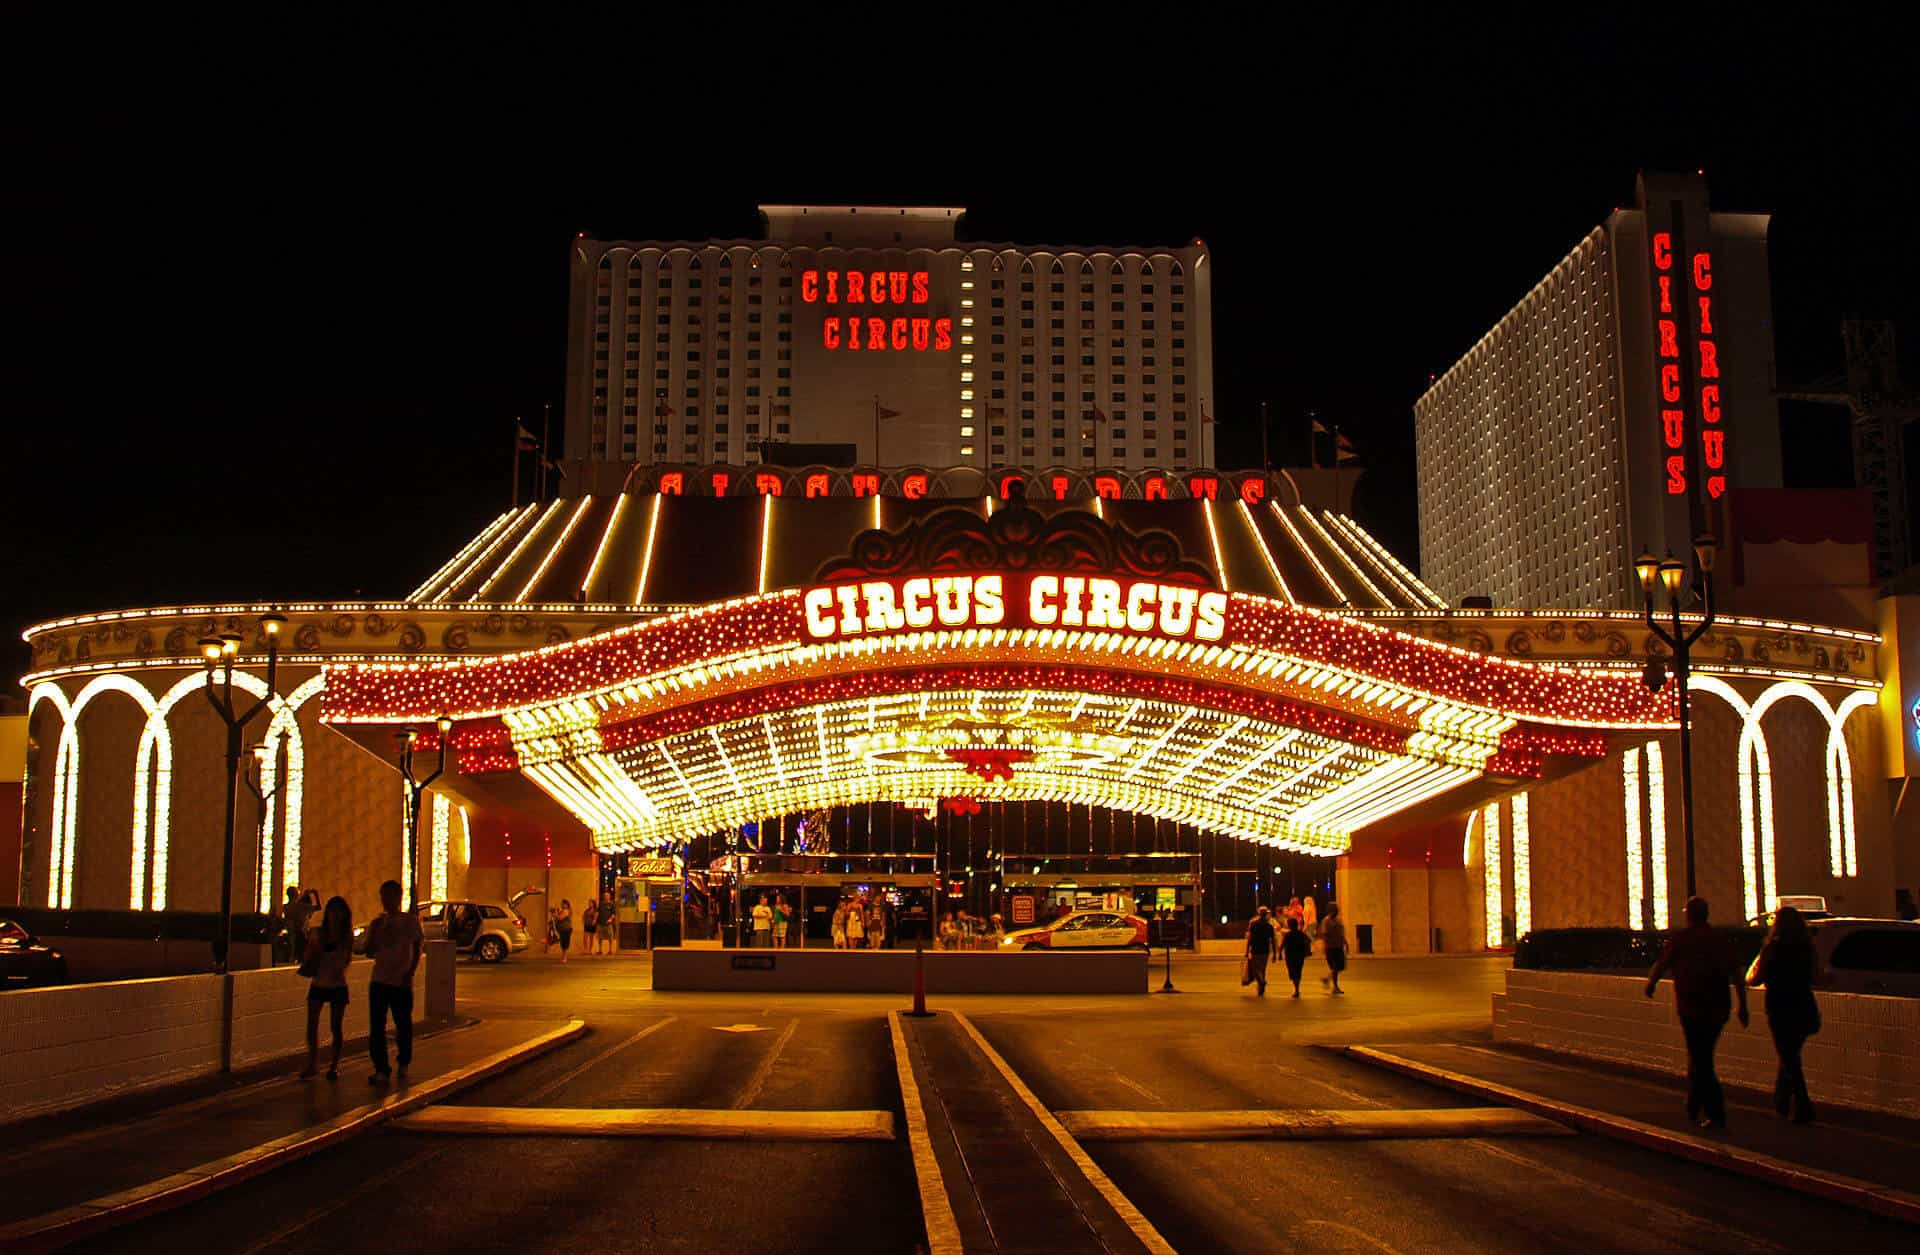 Hotel-circus-circus-Las-Vegas-atracciones-gastronomía-circo-